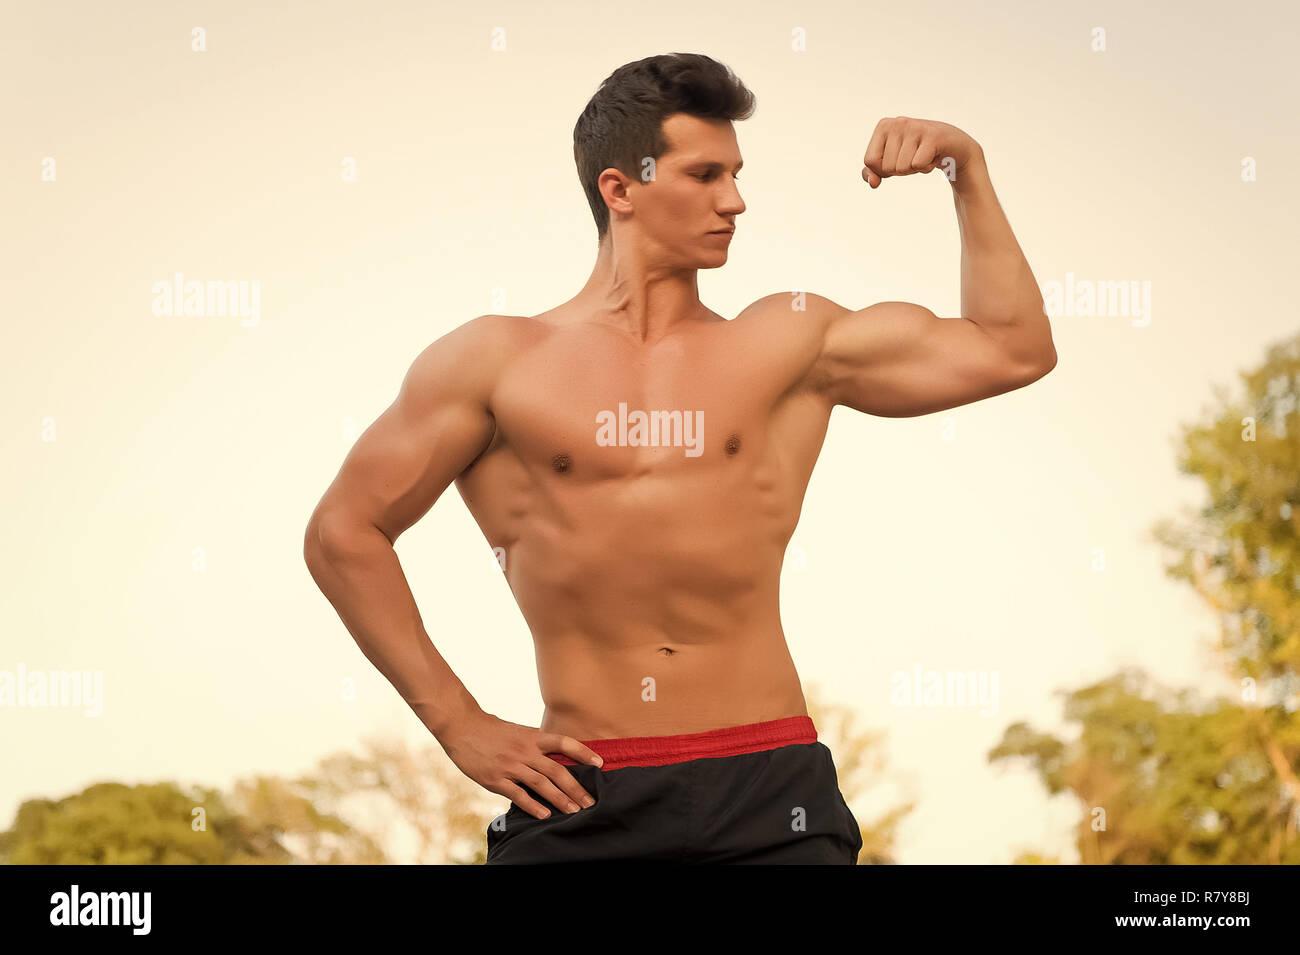 man flexing biceps arm